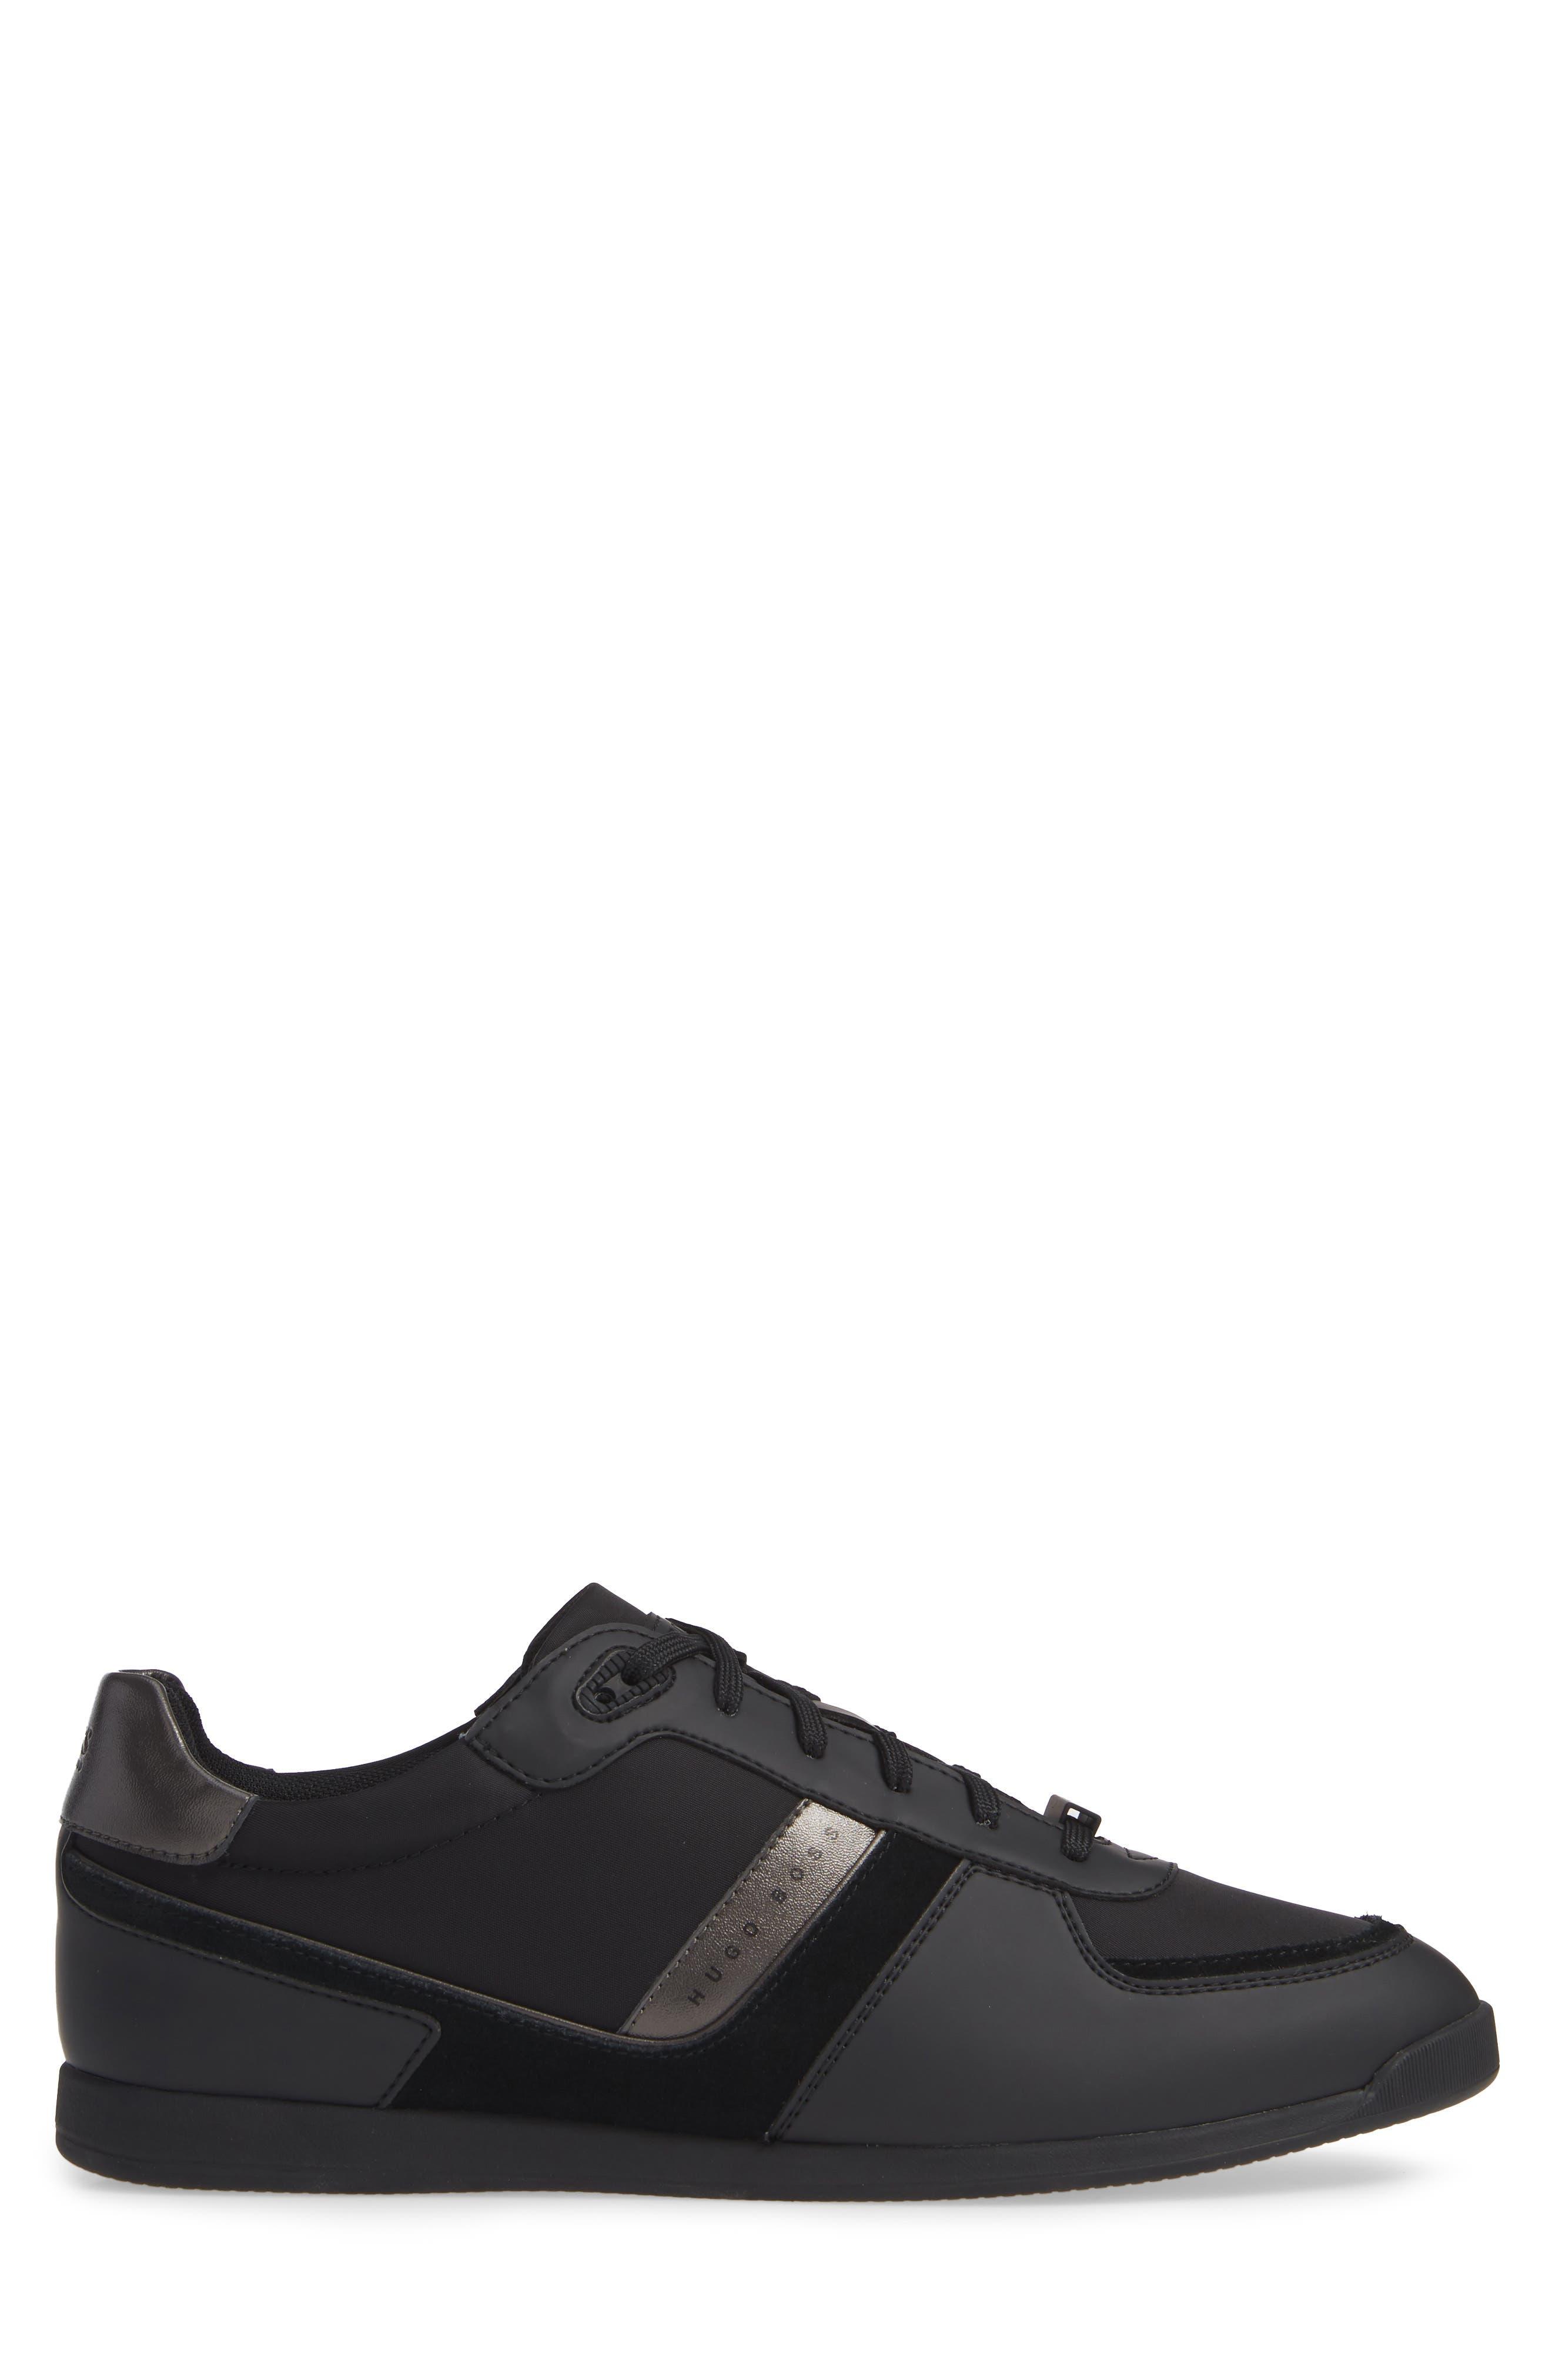 Maze Sneaker,                             Alternate thumbnail 3, color,                             BLACK